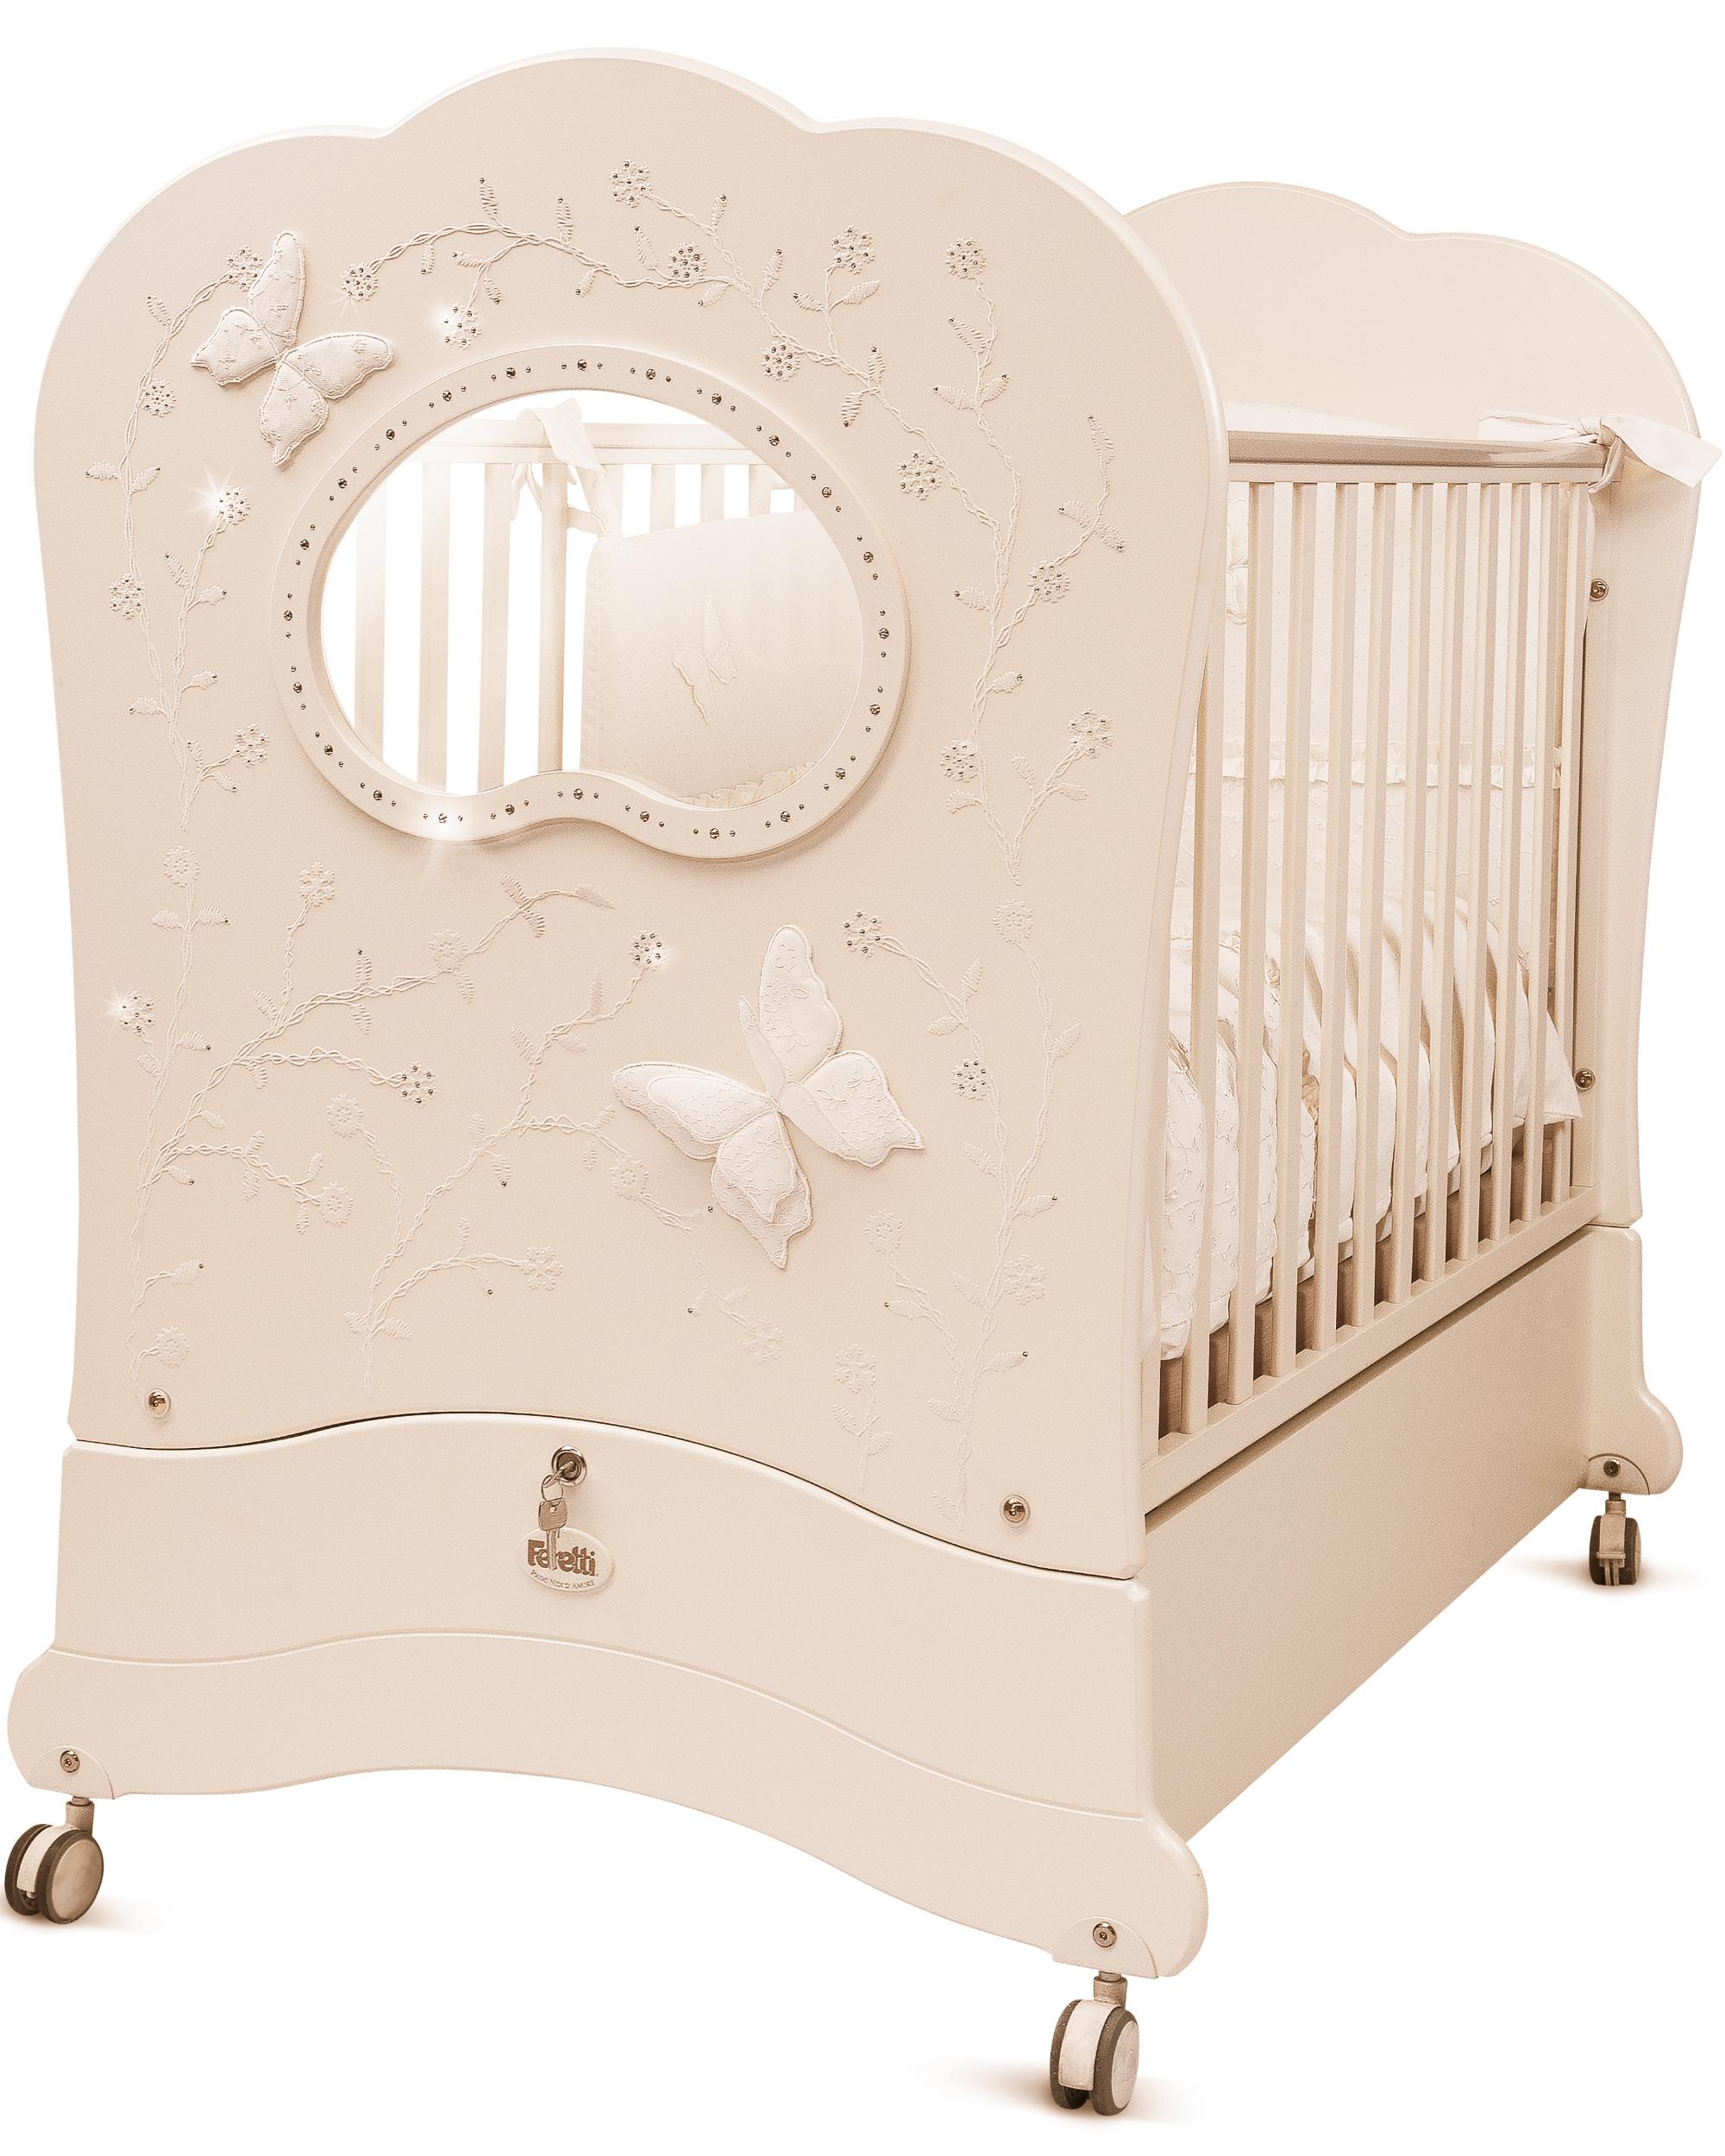 Кровать детская Feretti Fms Oblo Charme Brillante Avorio/ Ivory